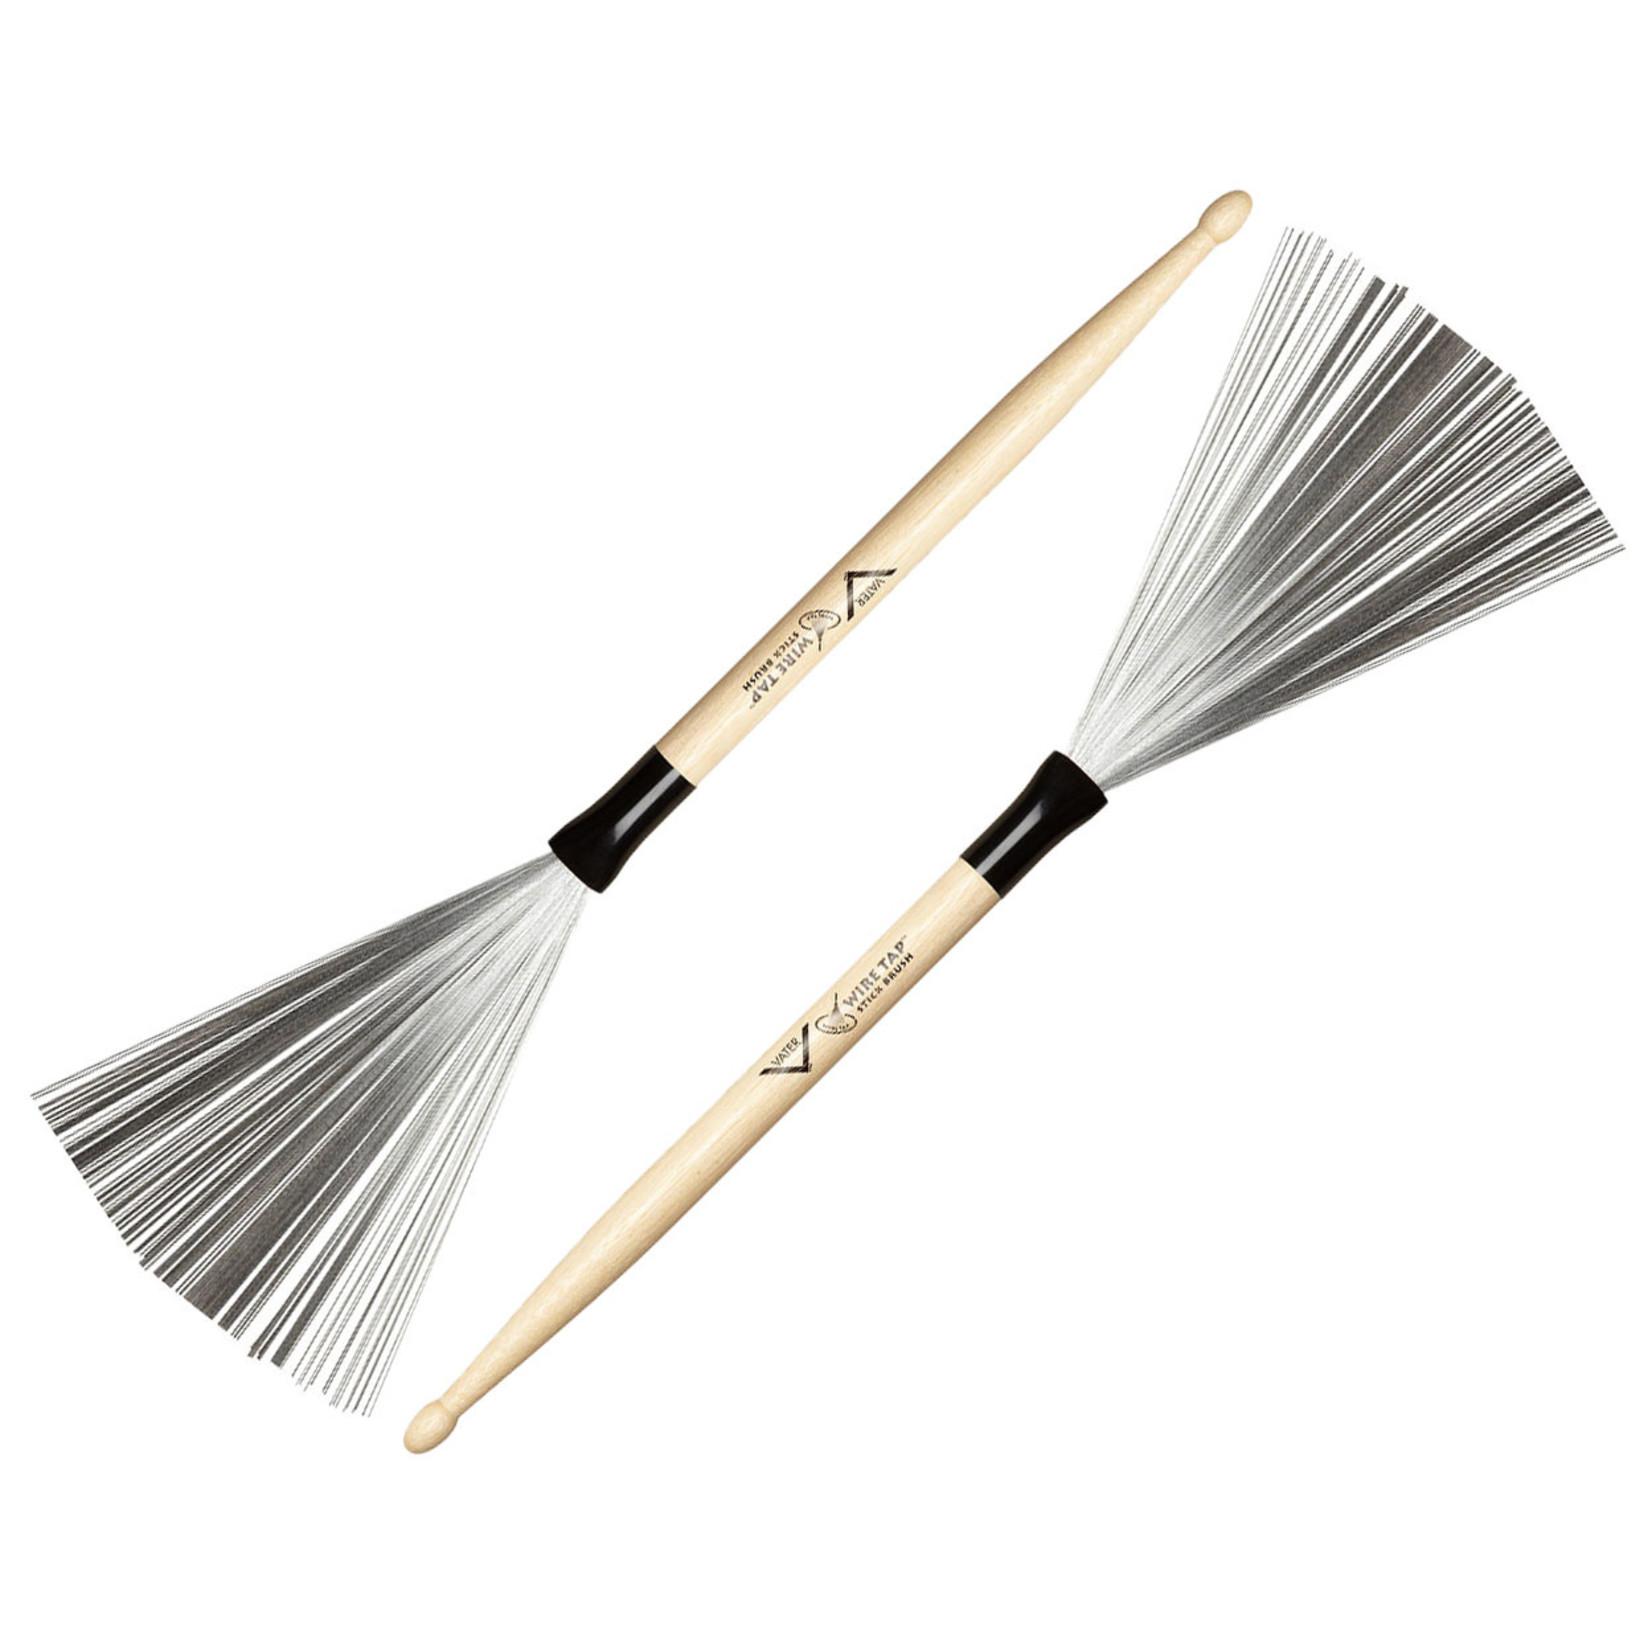 Vater Vater Drumstick Brush